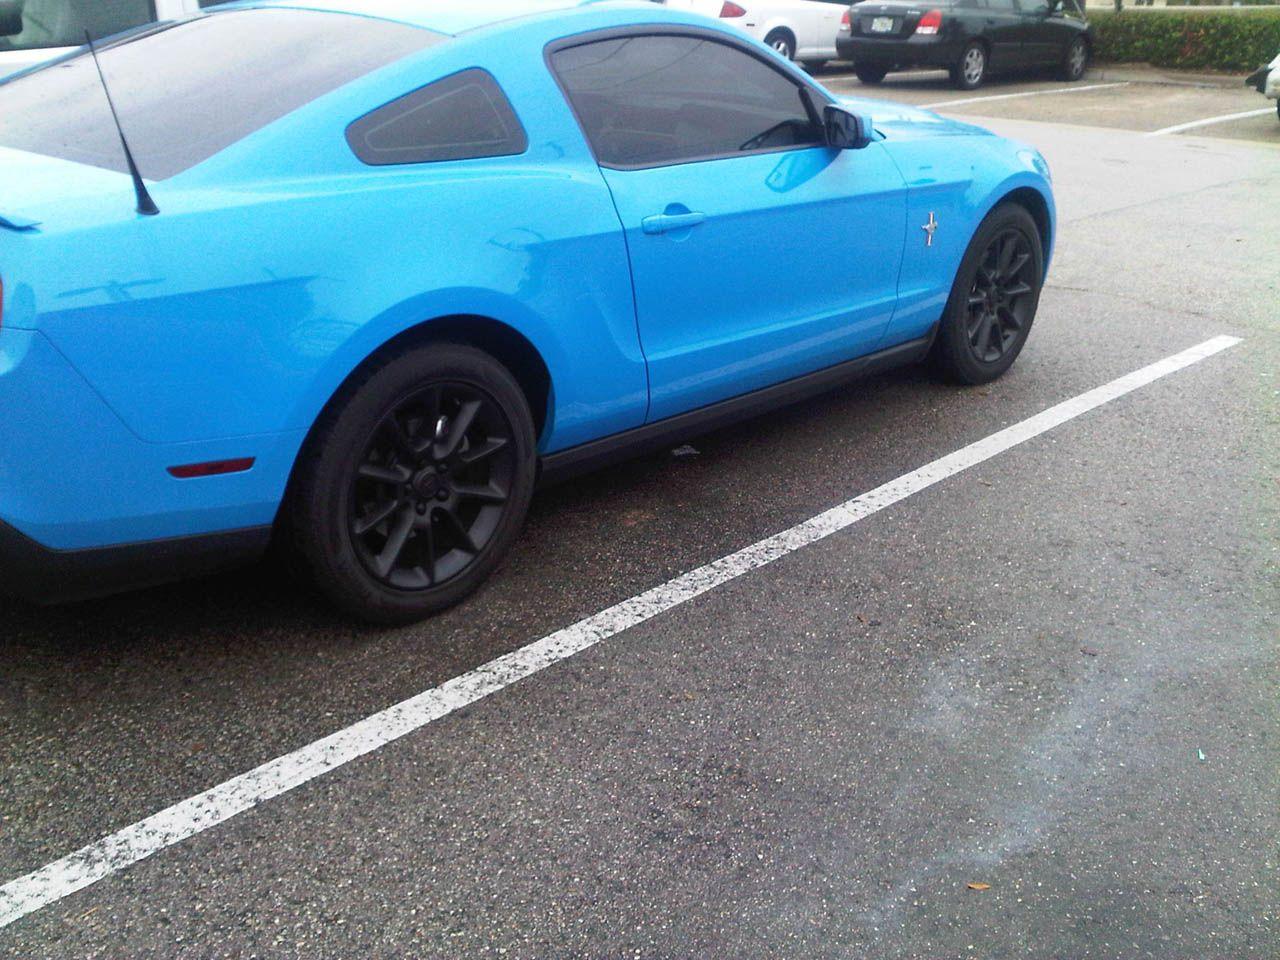 2011 Grabber Blue Ford Mustang V6 Auto, 3 73s, BAMA 93 Tune